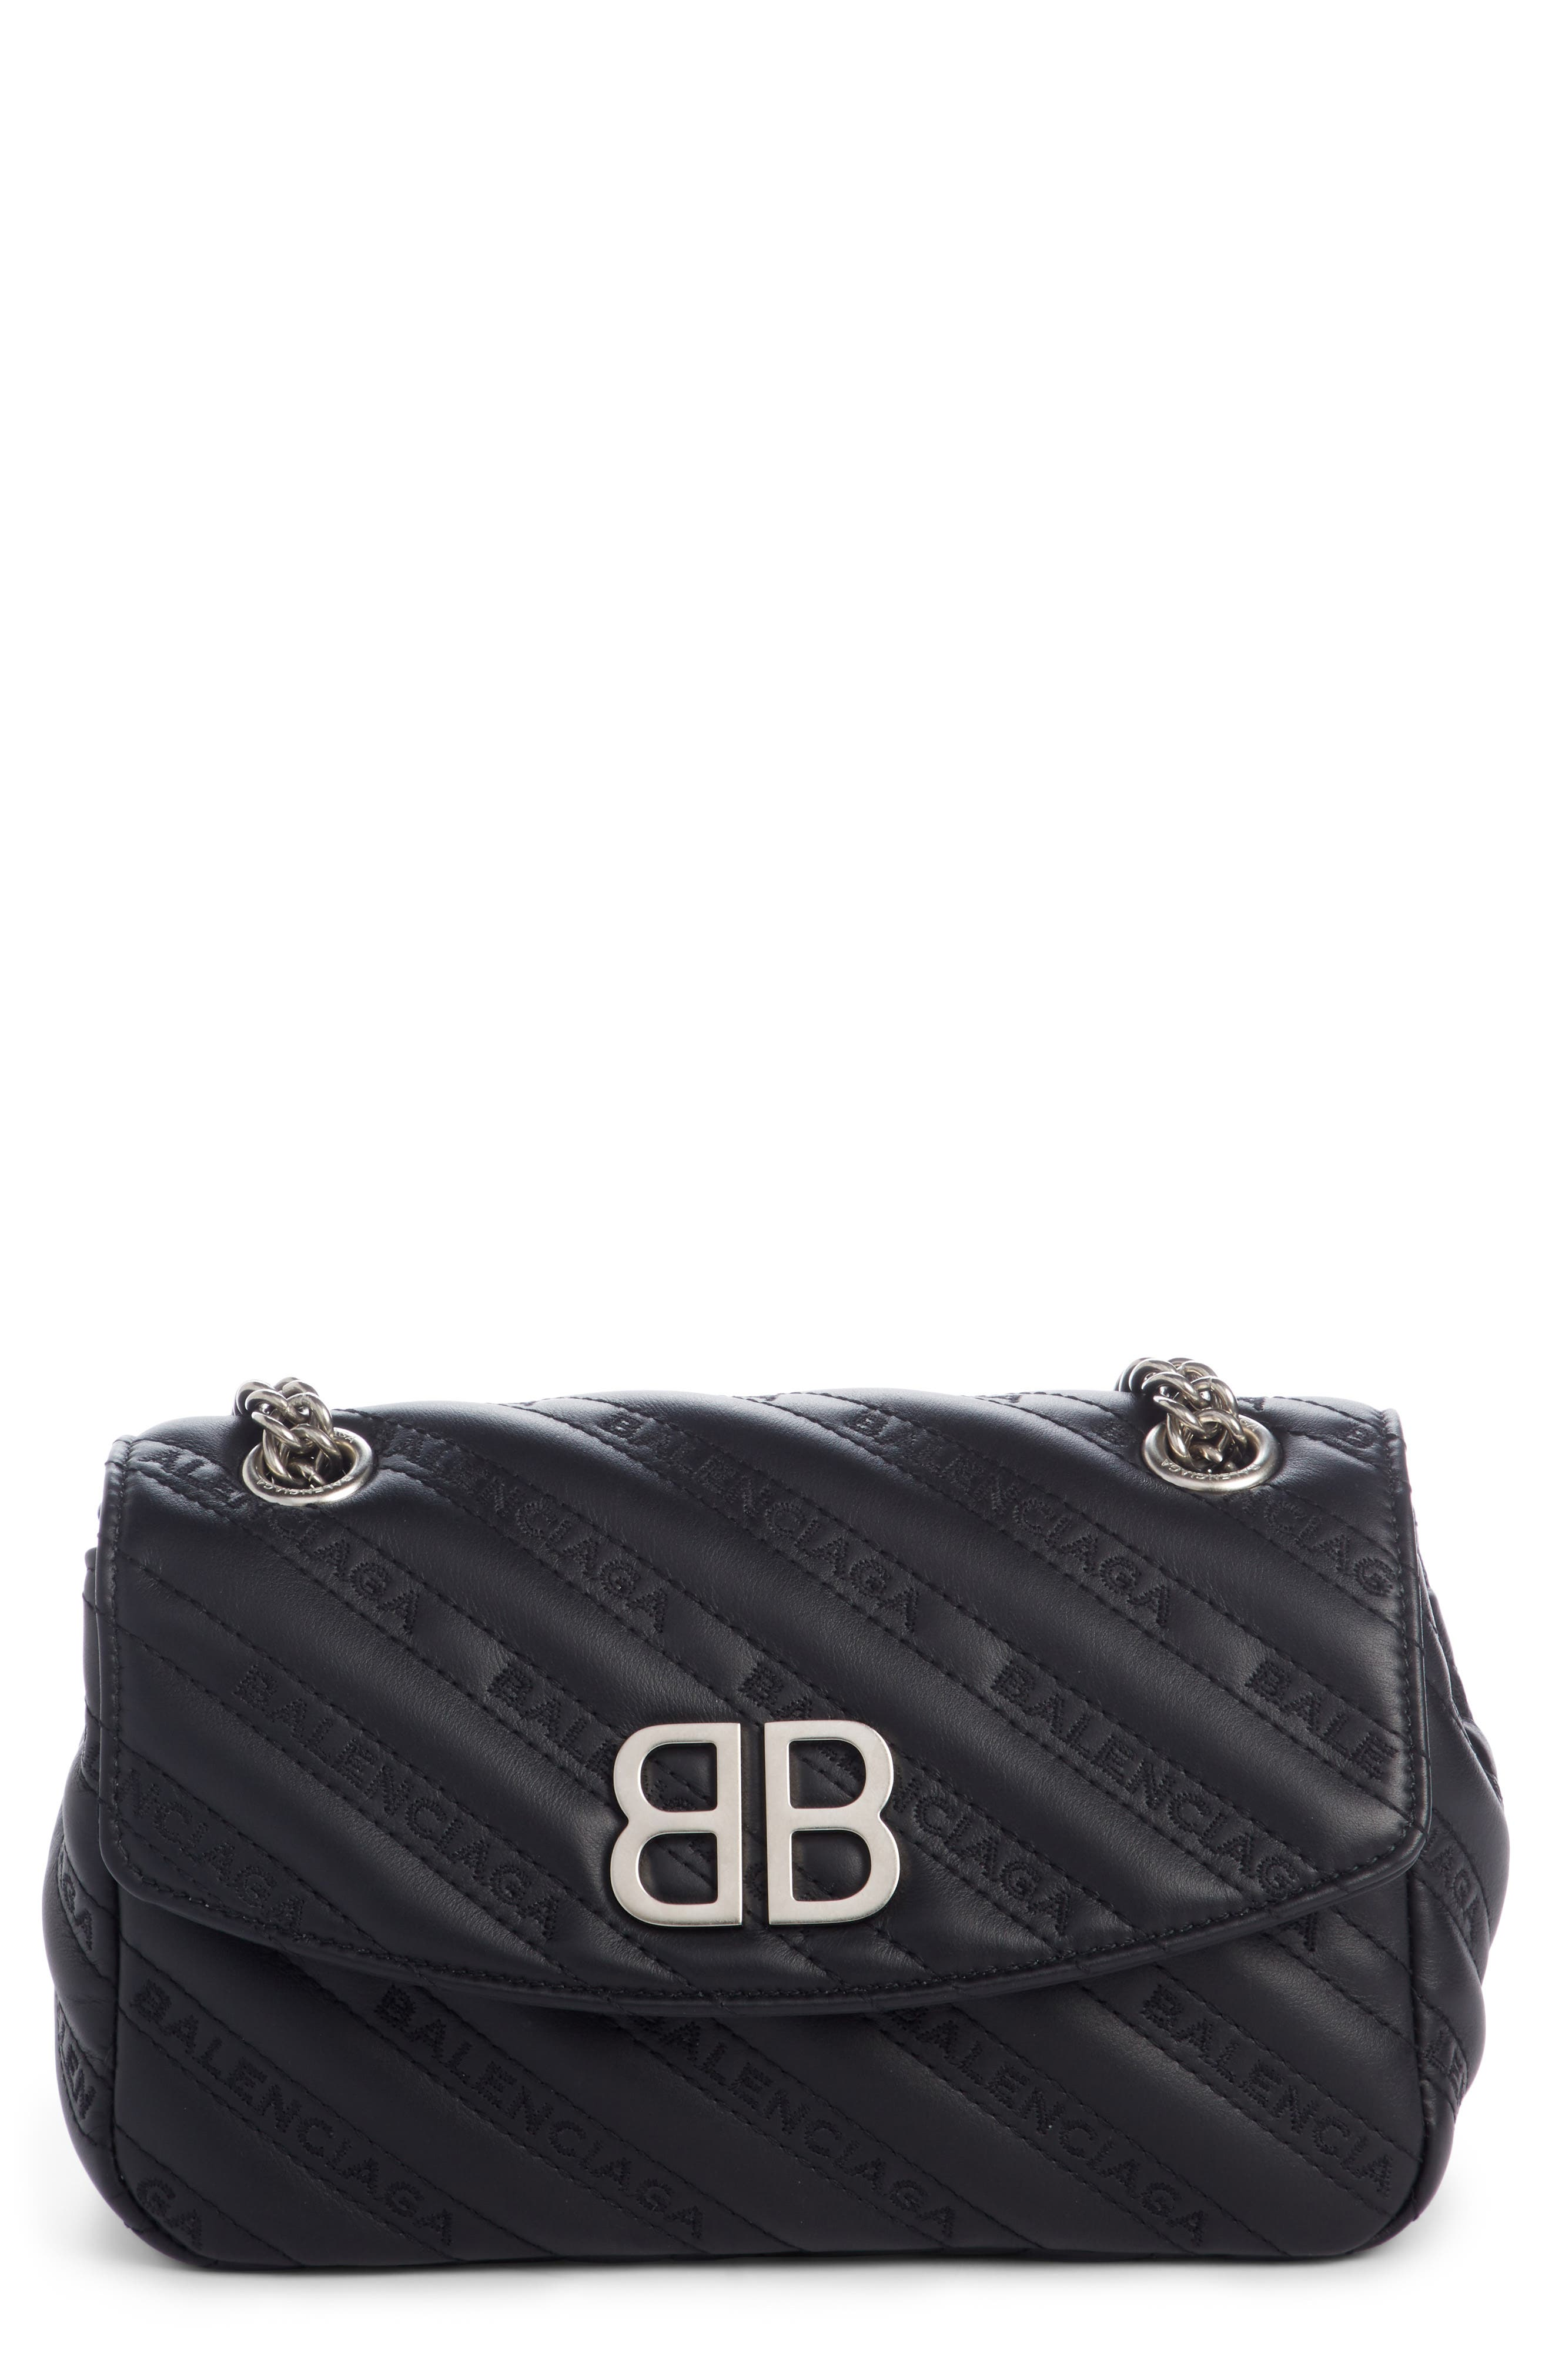 Balenciaga Small Matelasse Leather Shoulder Bag - Black In Noir